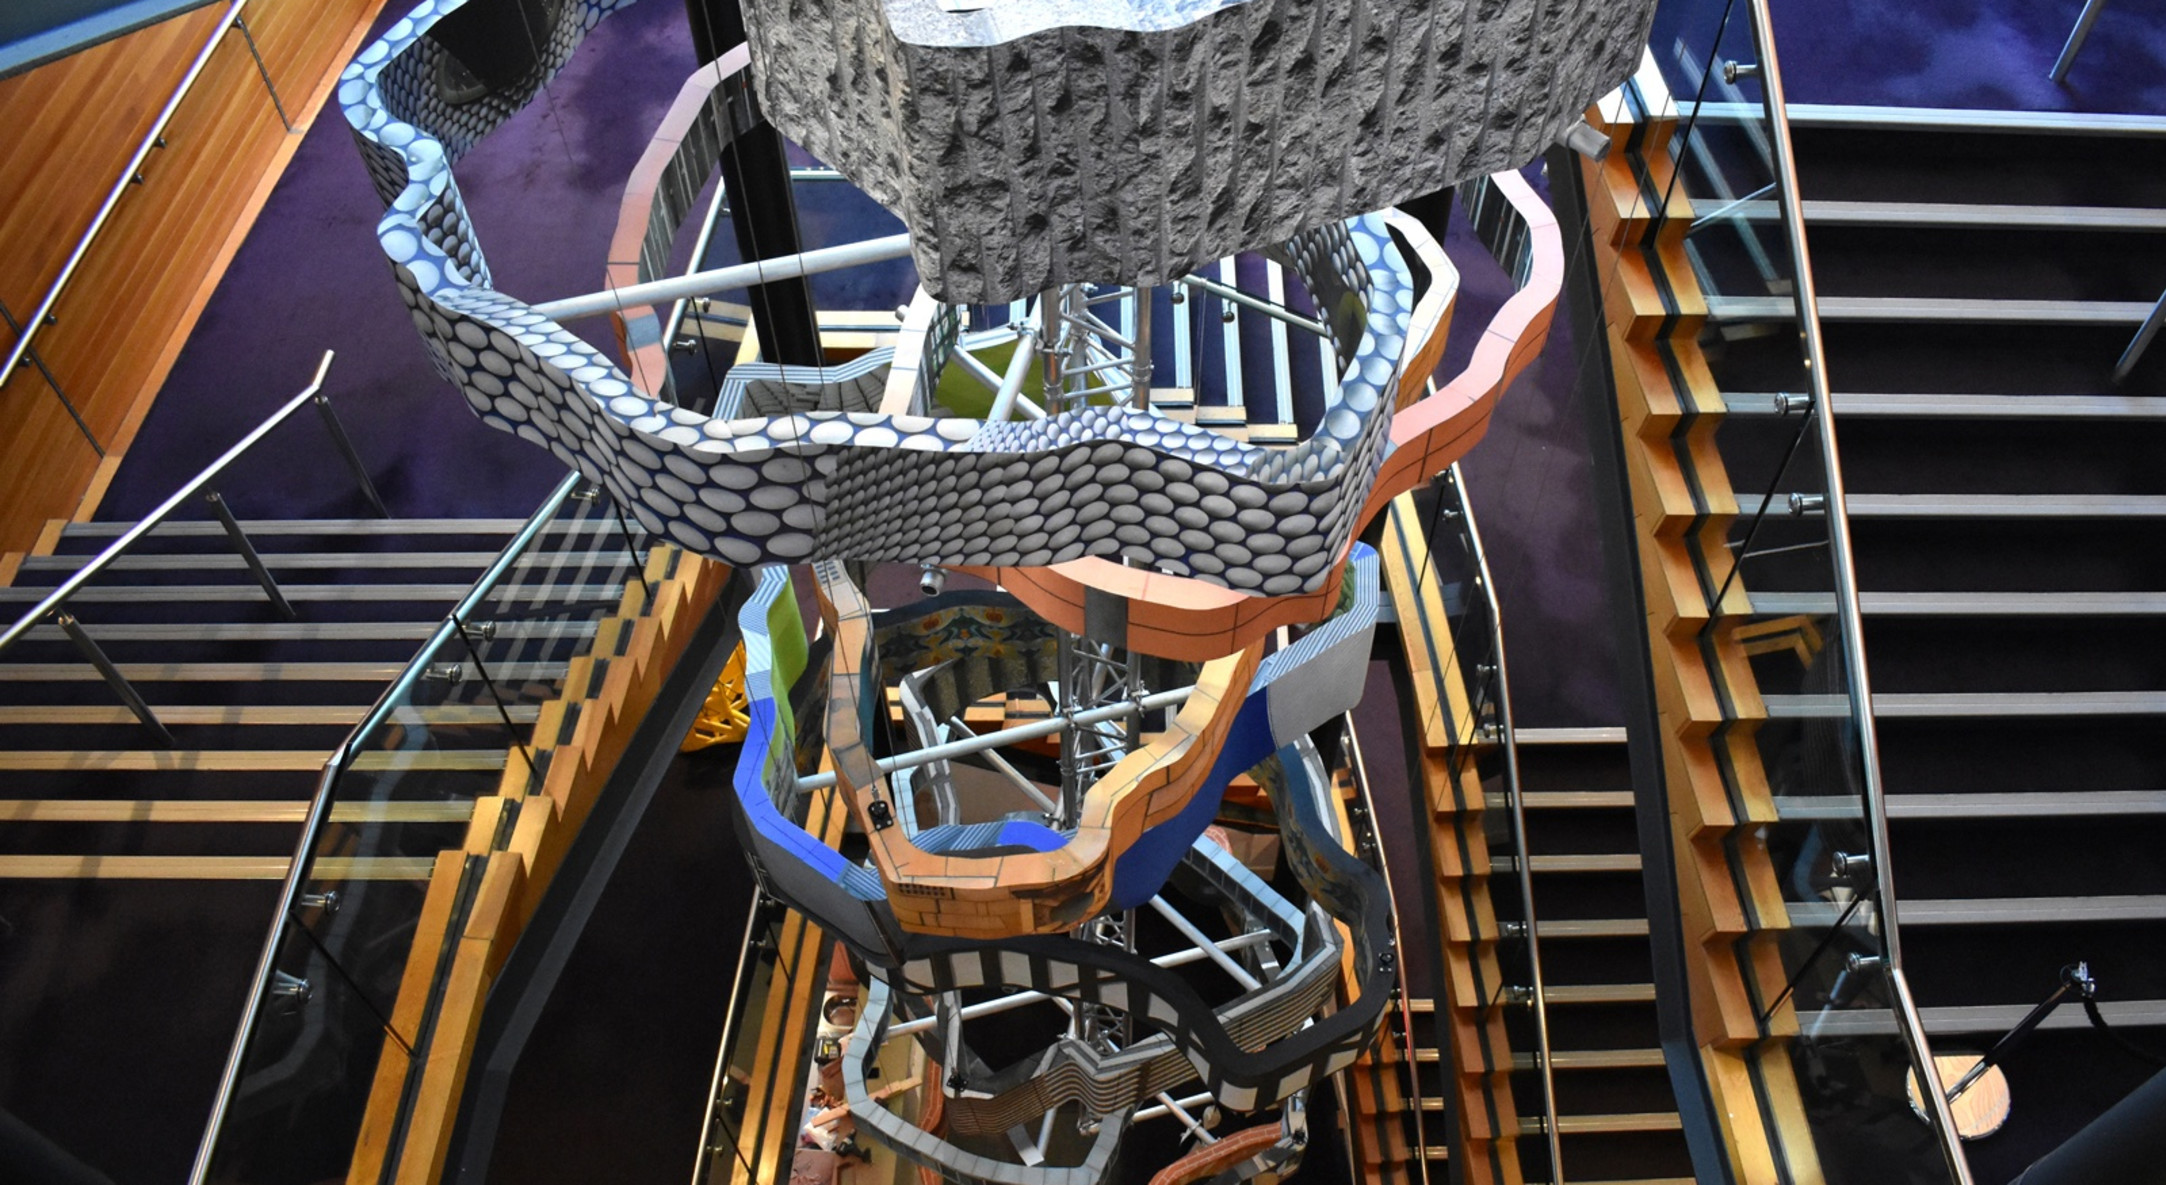 Installation view of Rachael Champion's Tower of Varieties, Birmingham Hippodrome, 2019